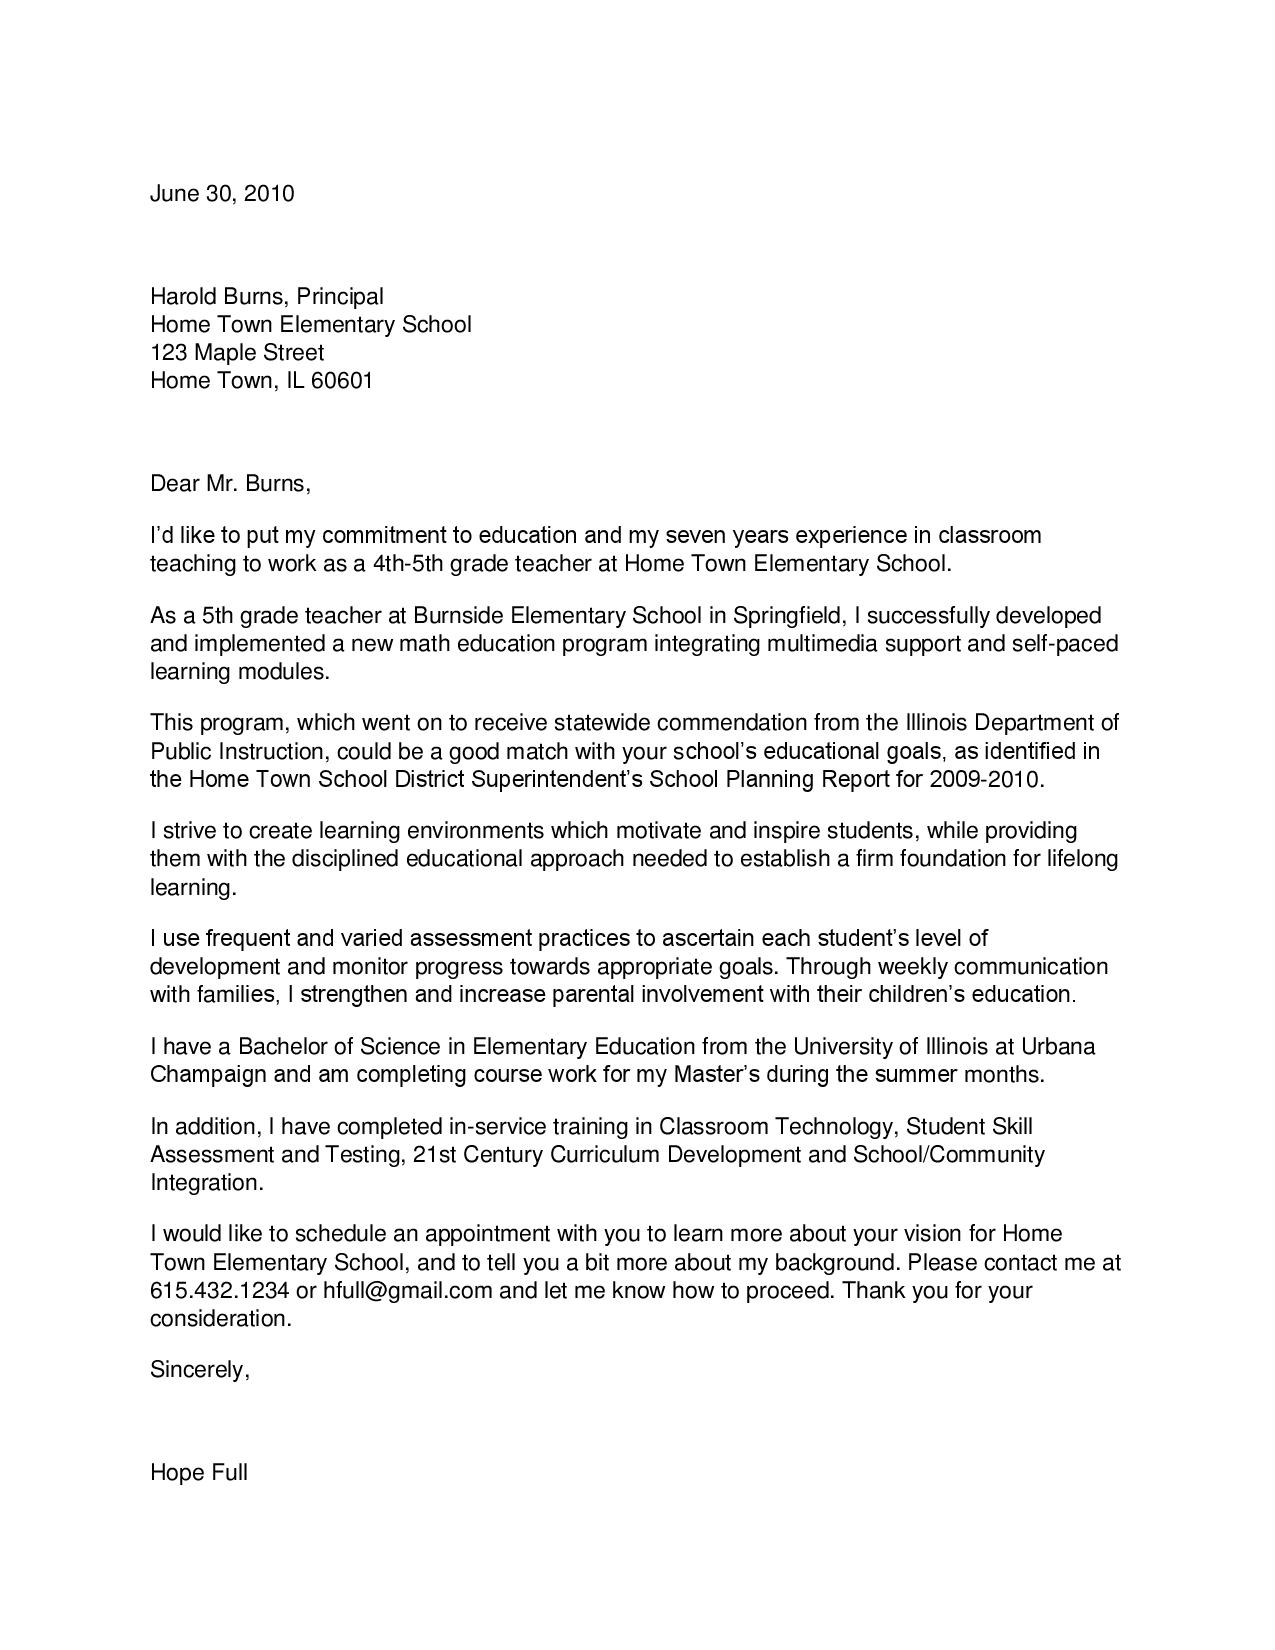 Cover Letter Resume Esl Application Letter Ghostwriter Professional Resume  Service In Birmingham Alabama Fsu Essay Help